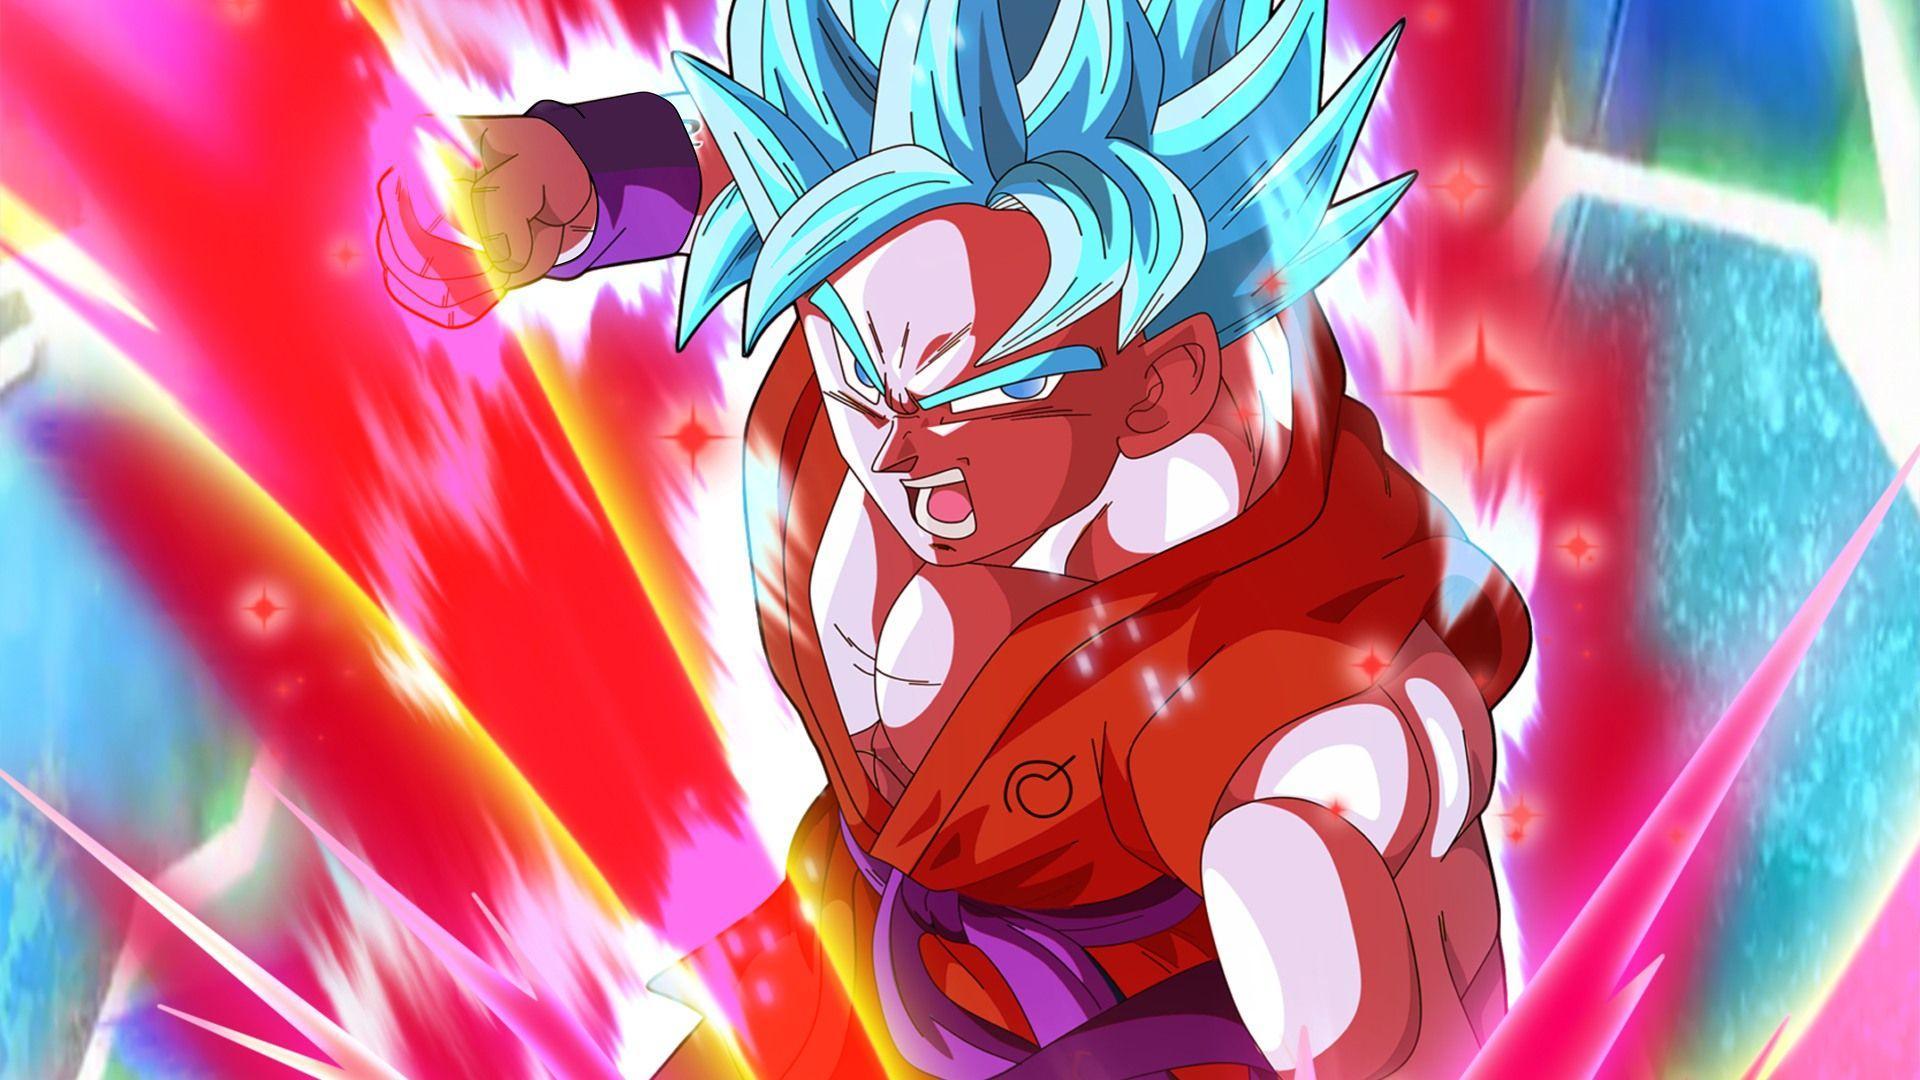 Goku Super Saiyan Blue Wallpapers Wallpaper Cave